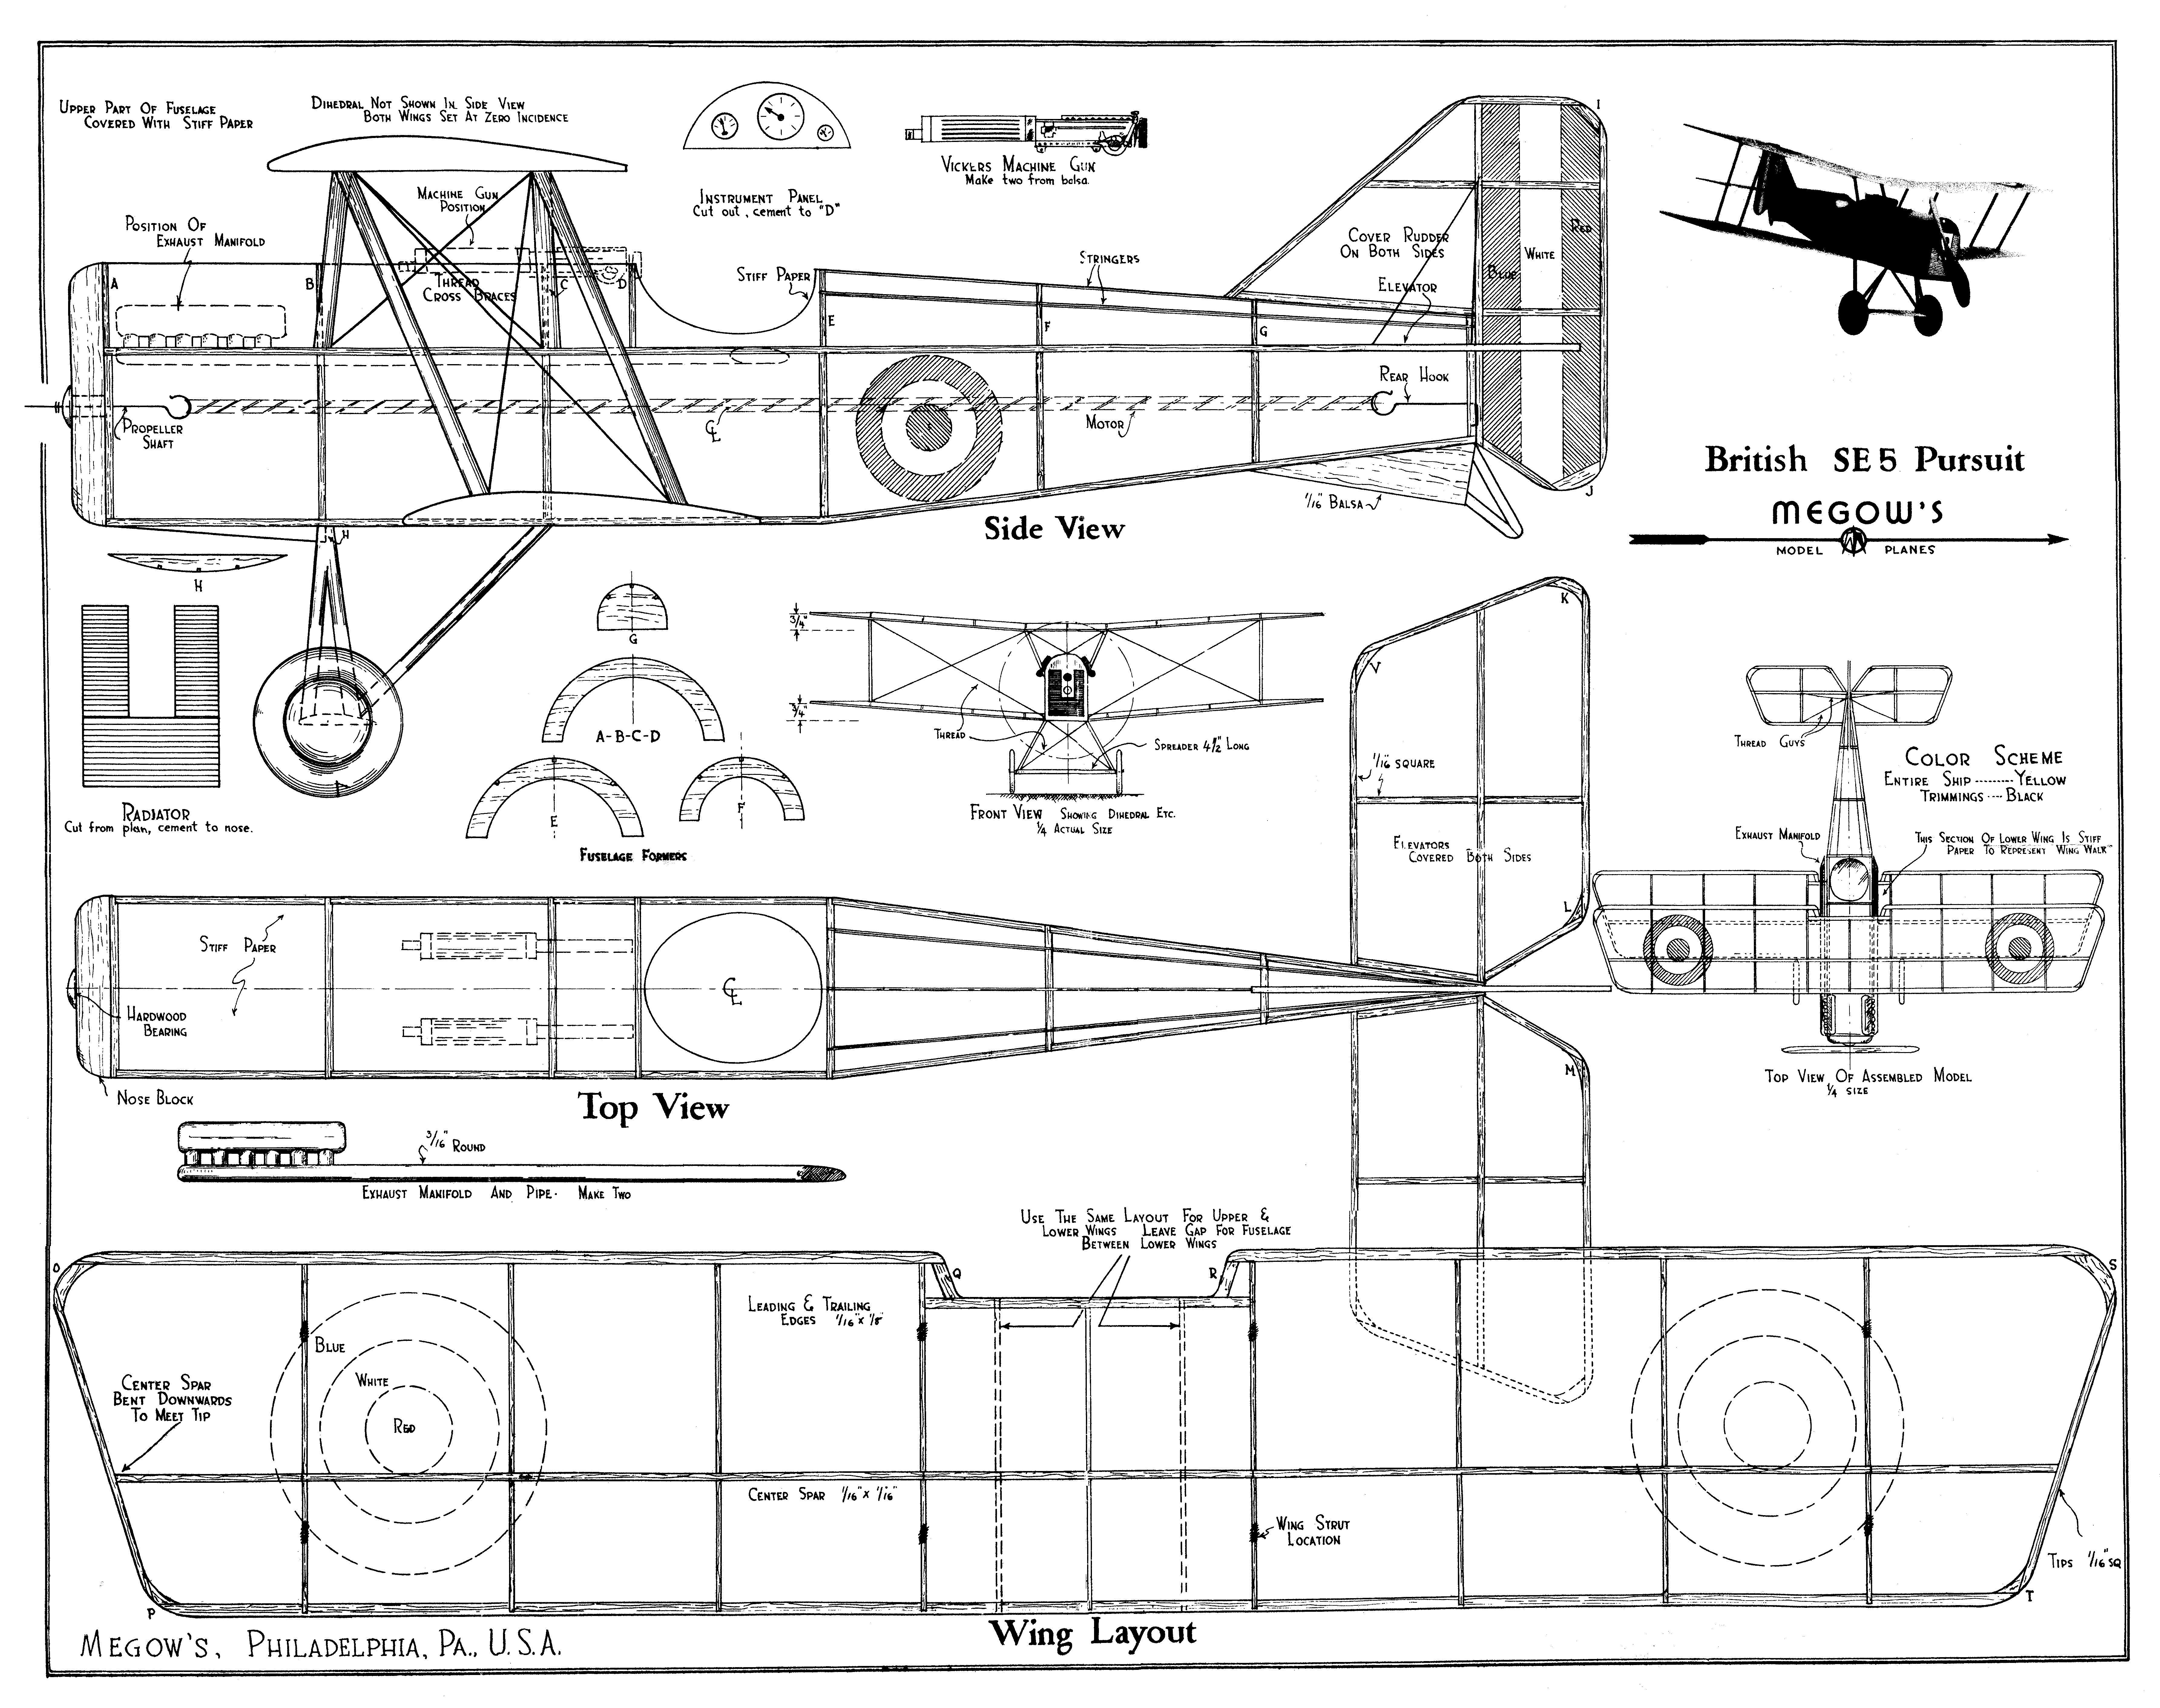 20 cretsiz vintage yazdrlabilir blueprints ve diyagramlar 20 cretsiz vintage yazdrlabilir blueprints ve diyagramlar remodelaholic printables blueprint malvernweather Images